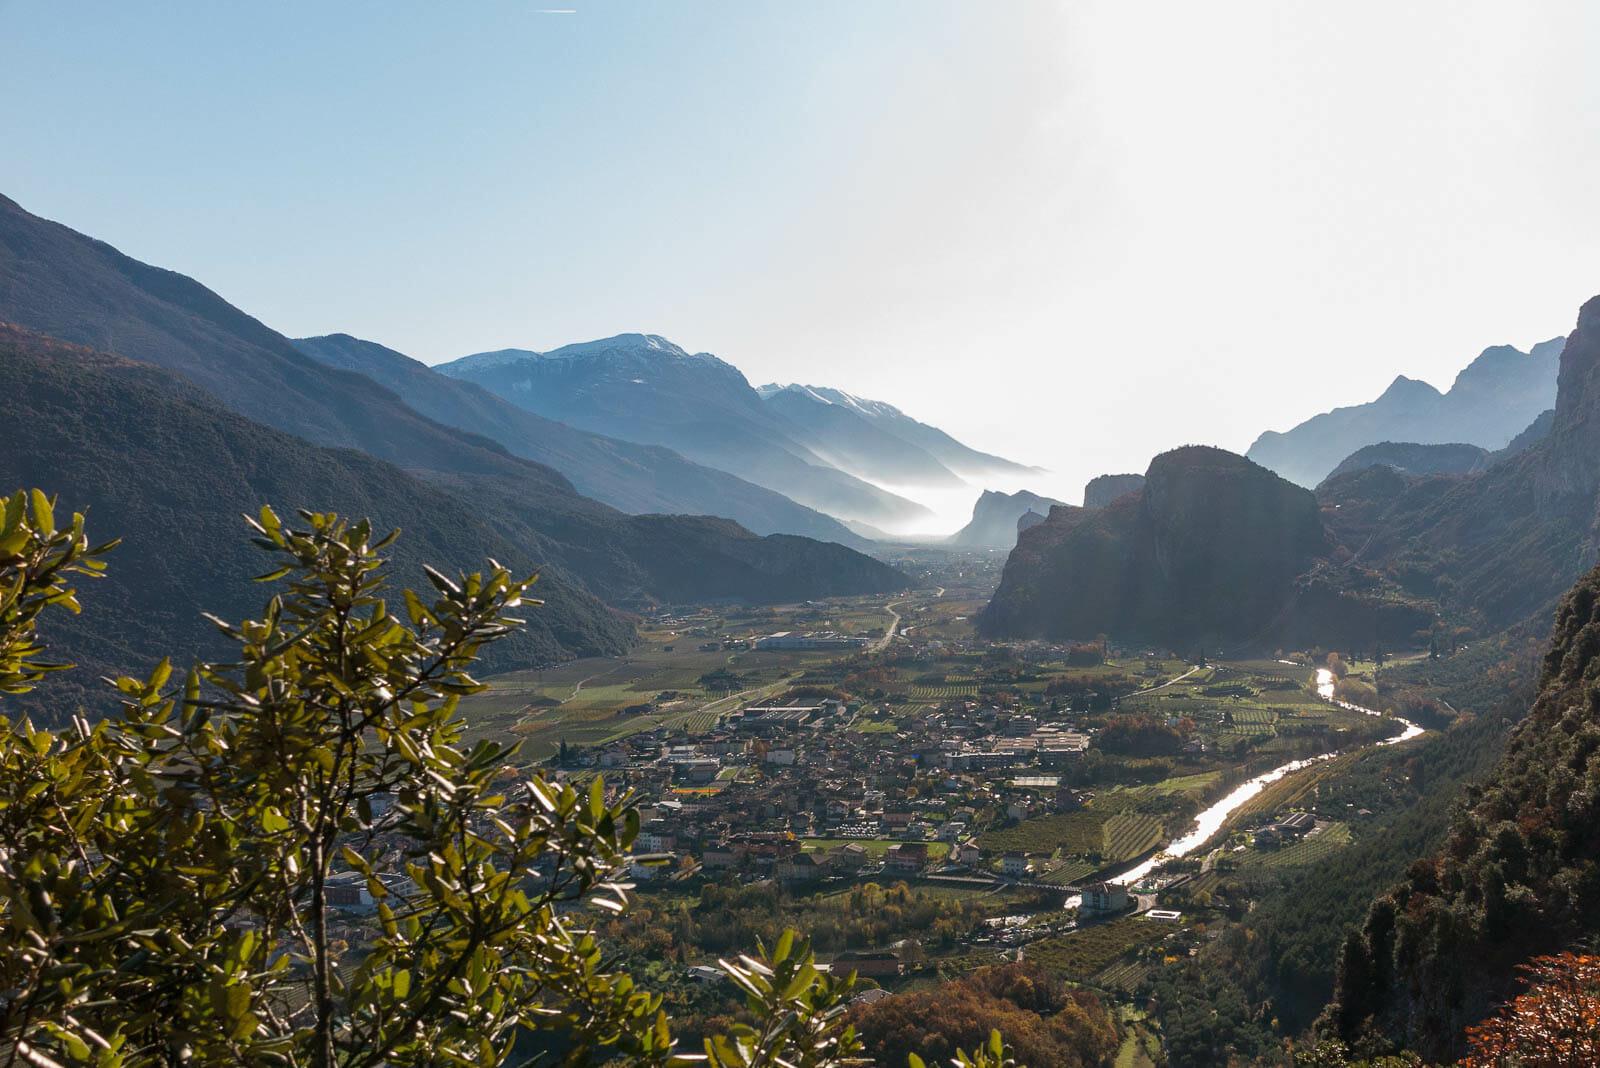 Klettersteig sentiero degli scaloni ausblick